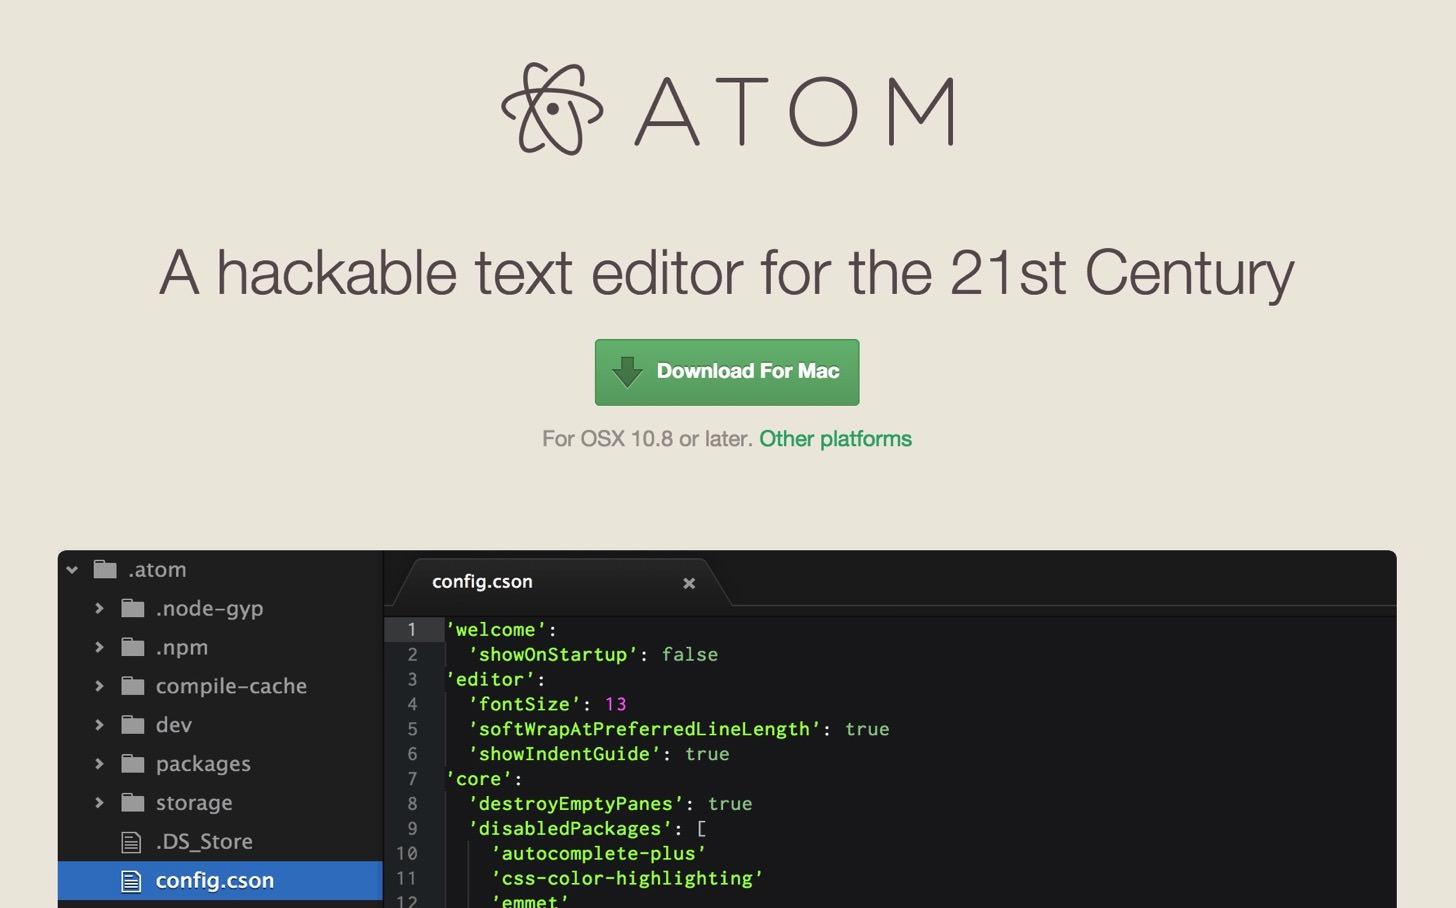 【Mac】Atom凄い!Markdownをリアルタイムでプレビューしながら書ける!HTML出力もできる!